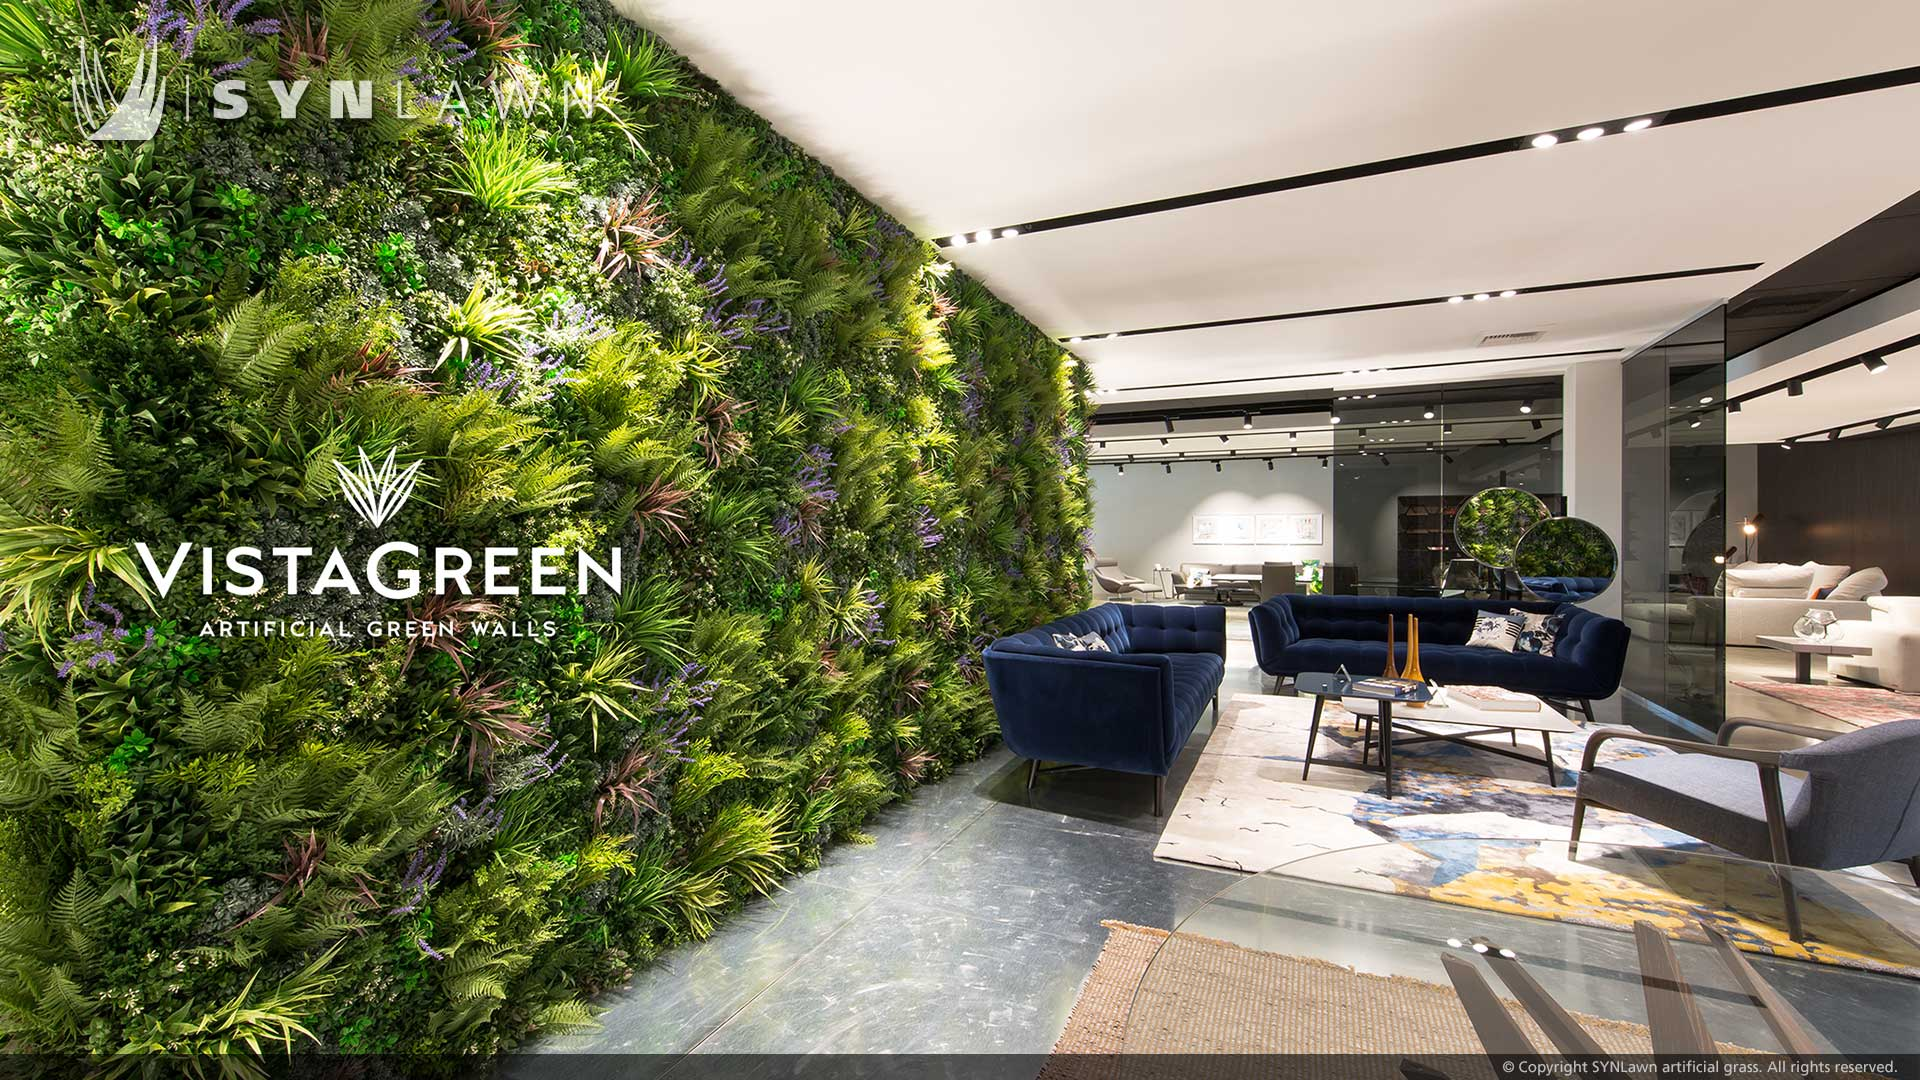 Vistagreen Artificial green walls